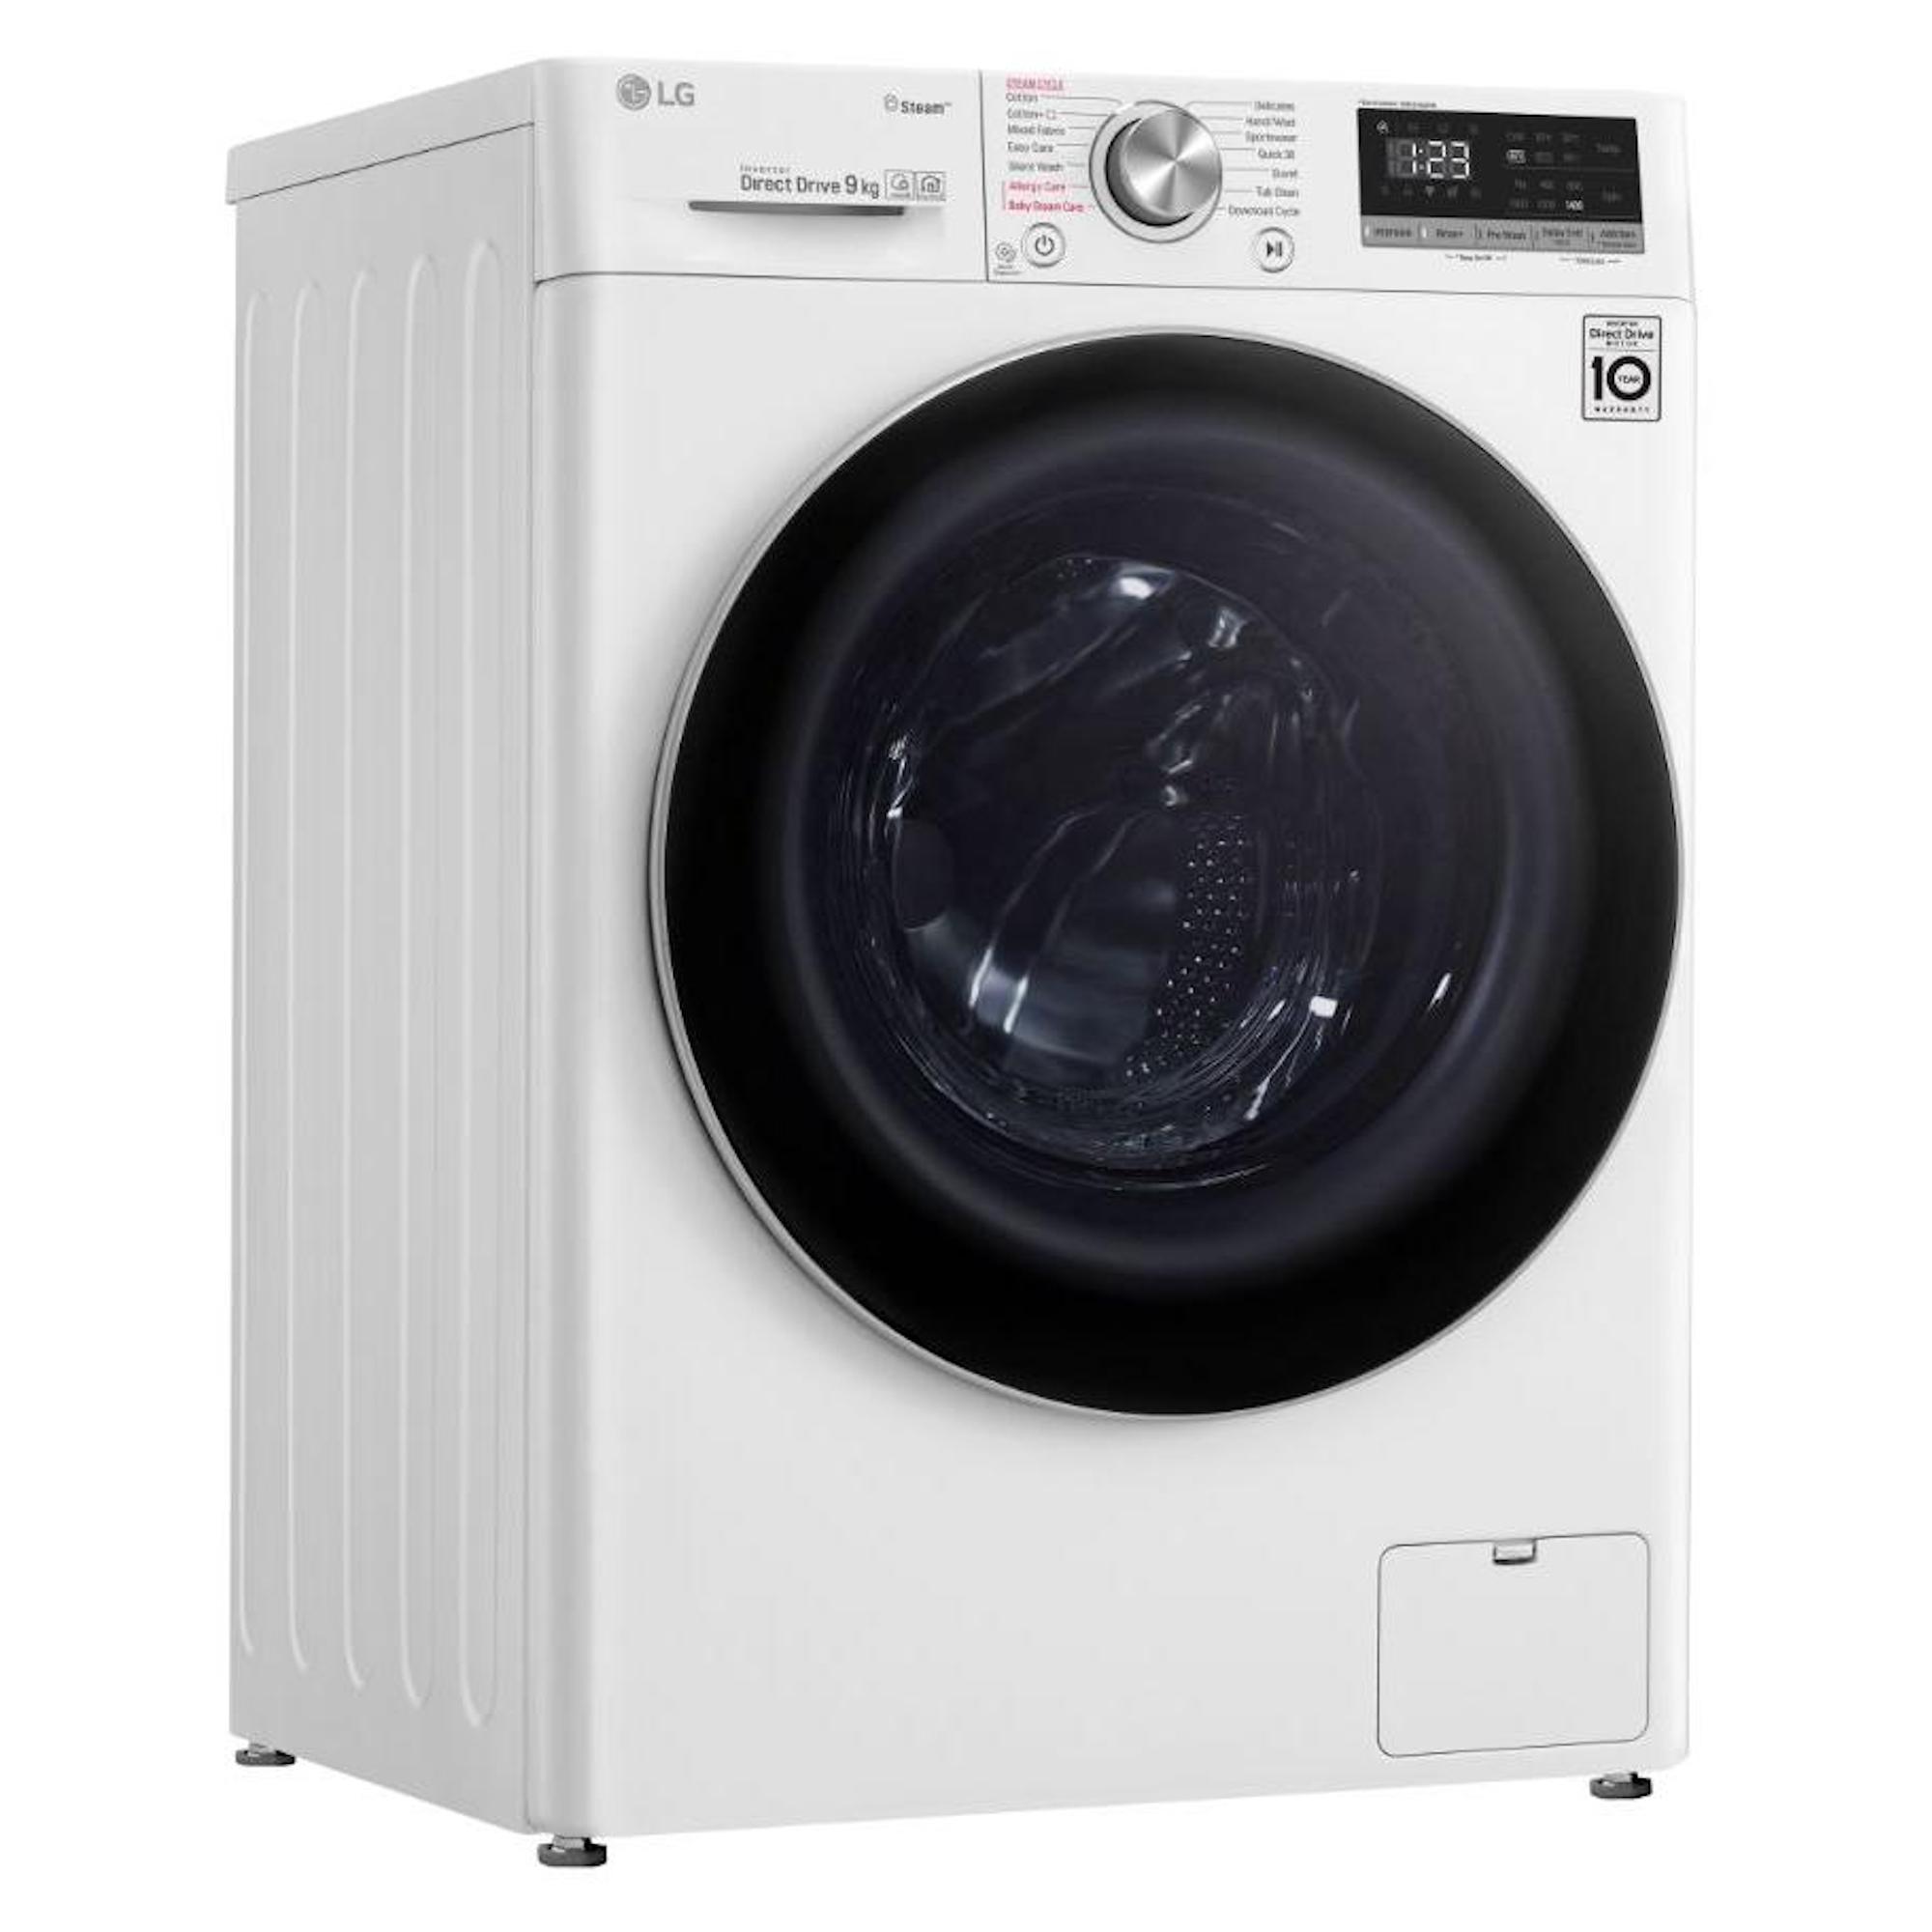 LG F4V509WS 9kg 1400rpm Washing Machine with Steam Technology + 5 year warranty £383.20 with code @ Hughes Direct ebay